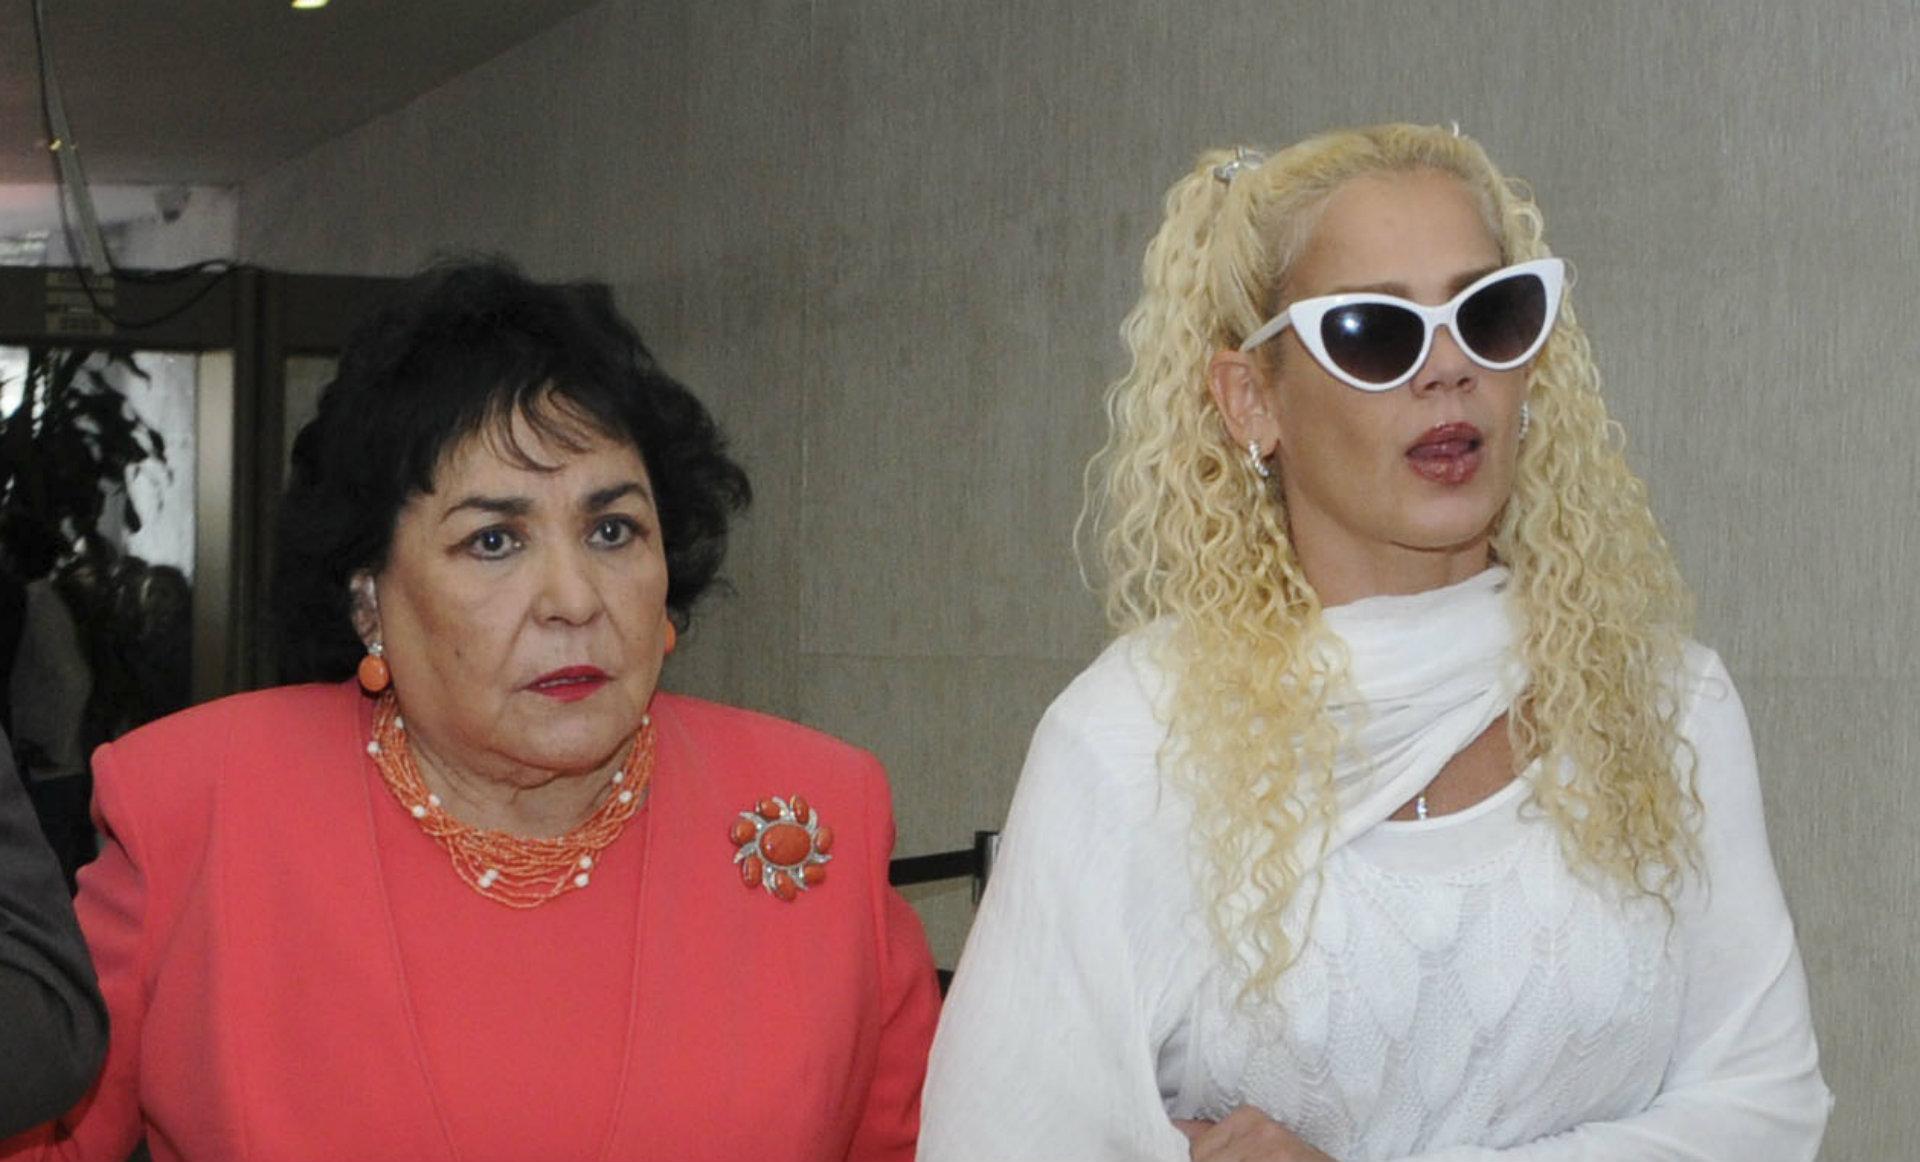 Coronavirus En Mexico Carmen Salinas Dijo Que La Pandemia Es Un Castigo Por Comer Perros Infobae Carmen salinas lamenta ataque a garcía harfuch. carmen salinas dijo que la pandemia